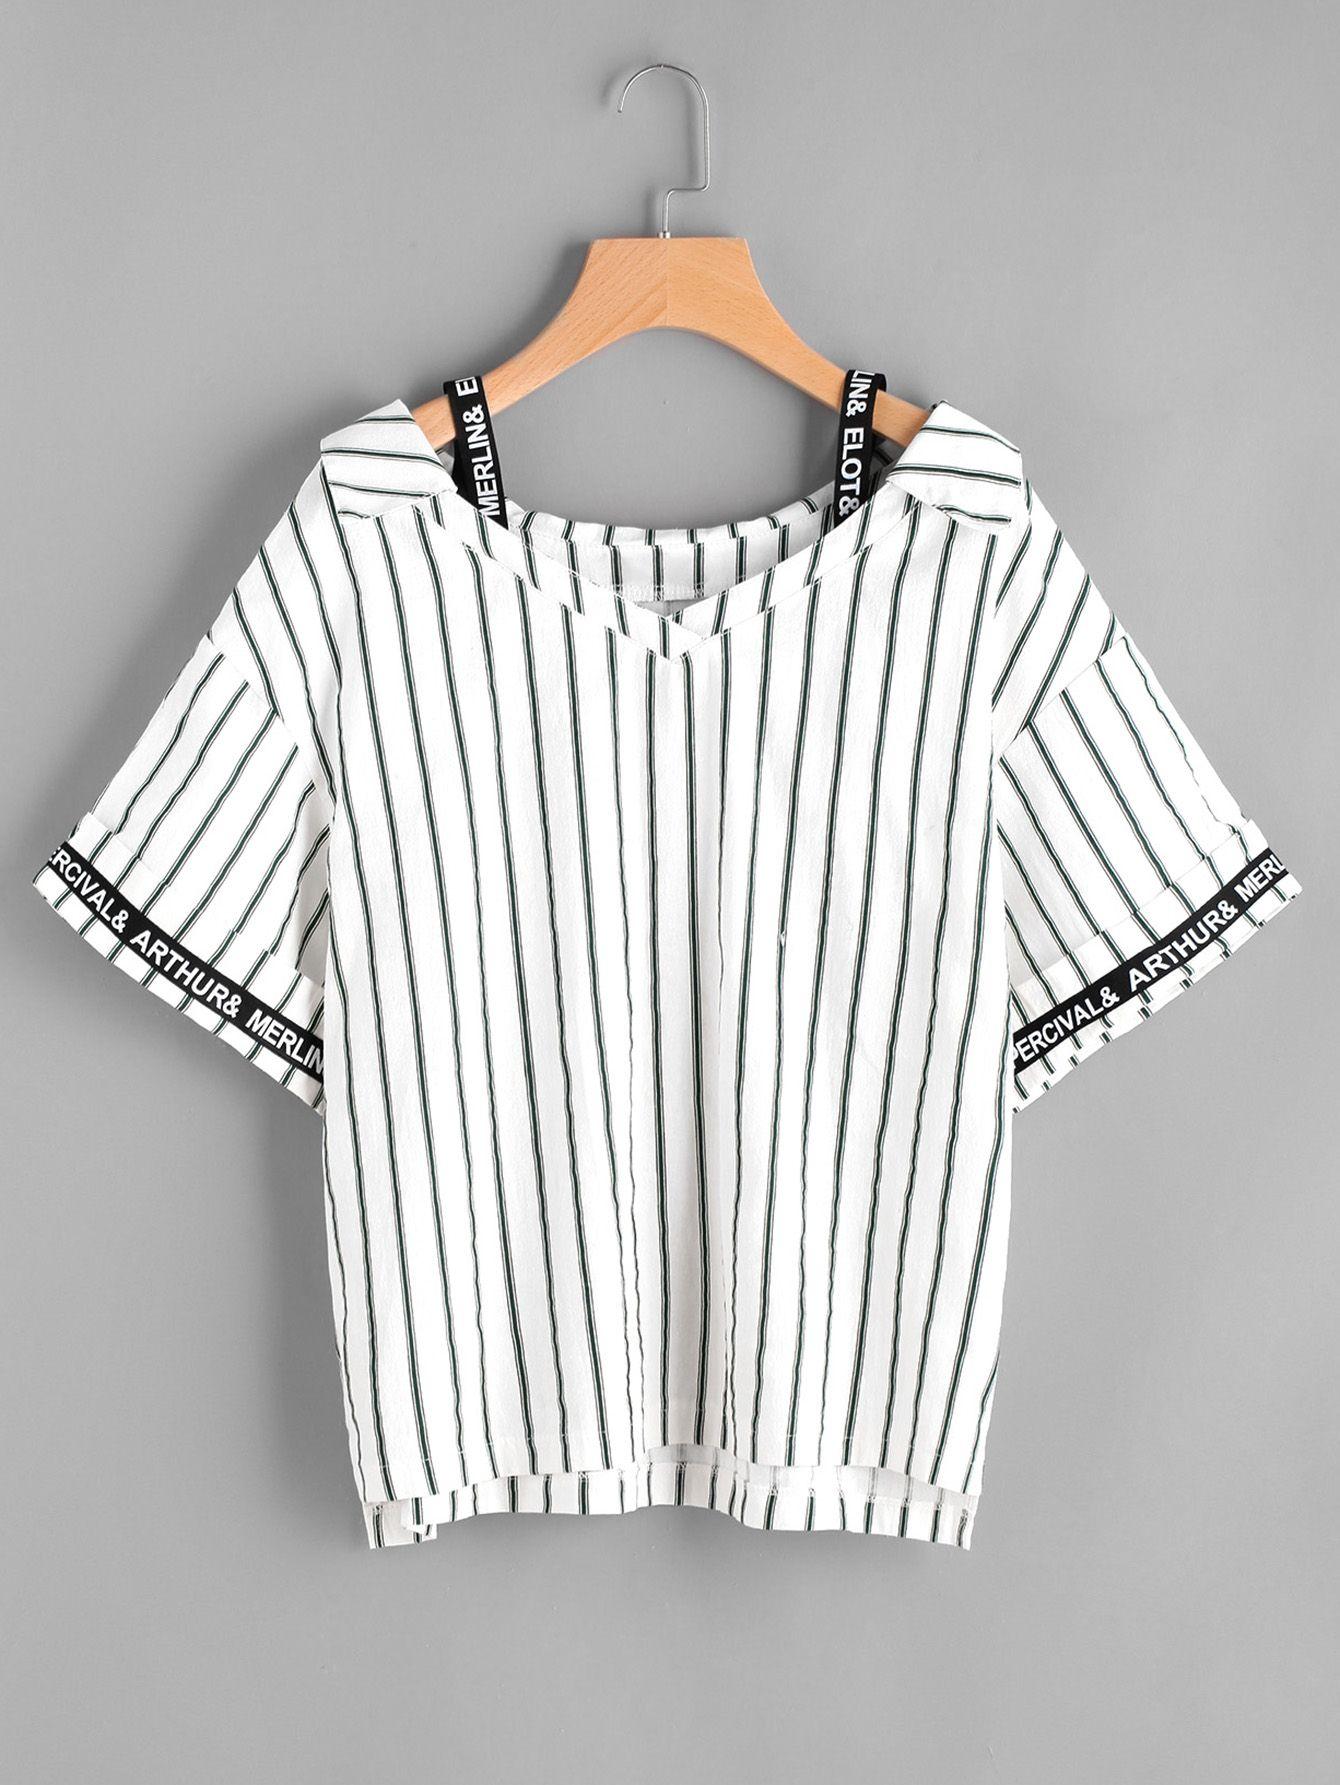 c6fc9f2cbe1 Percival & Merlin & Arthur | Clothes | Tops, Fashion, Fashion tape